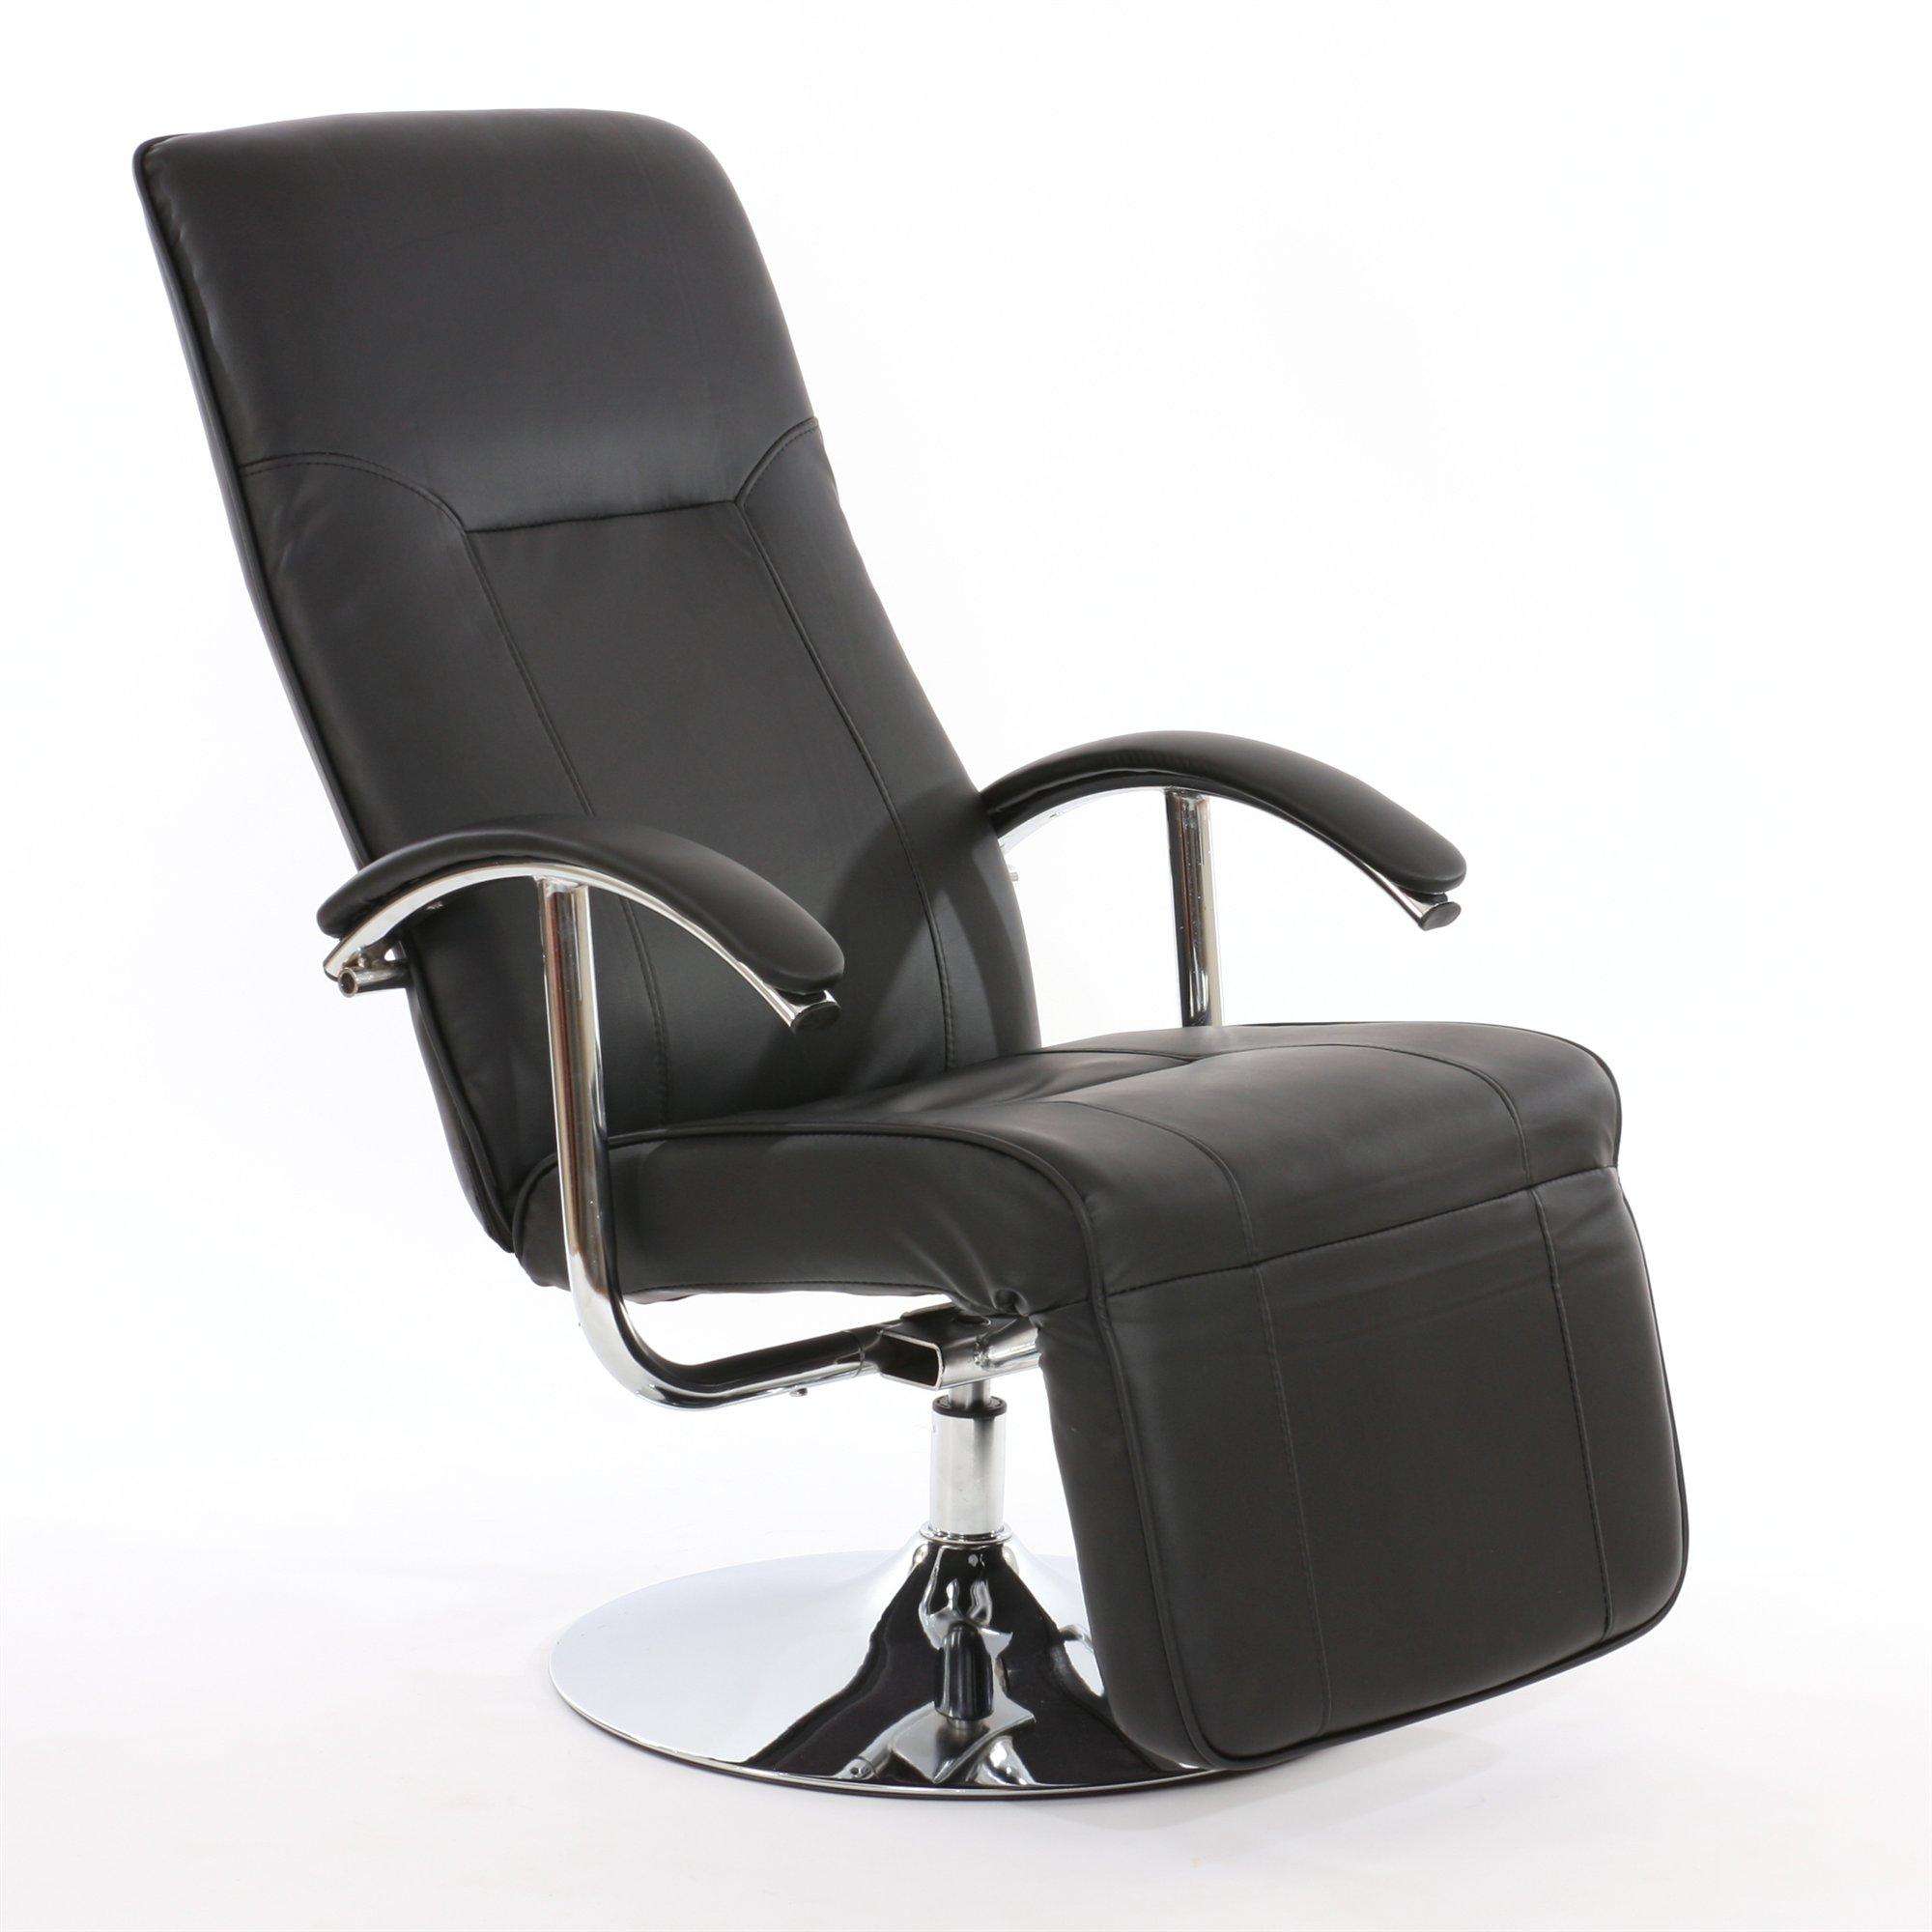 Sill n relax reclinable modelo apia ii en piel color negro for Sillon relax ikea piel